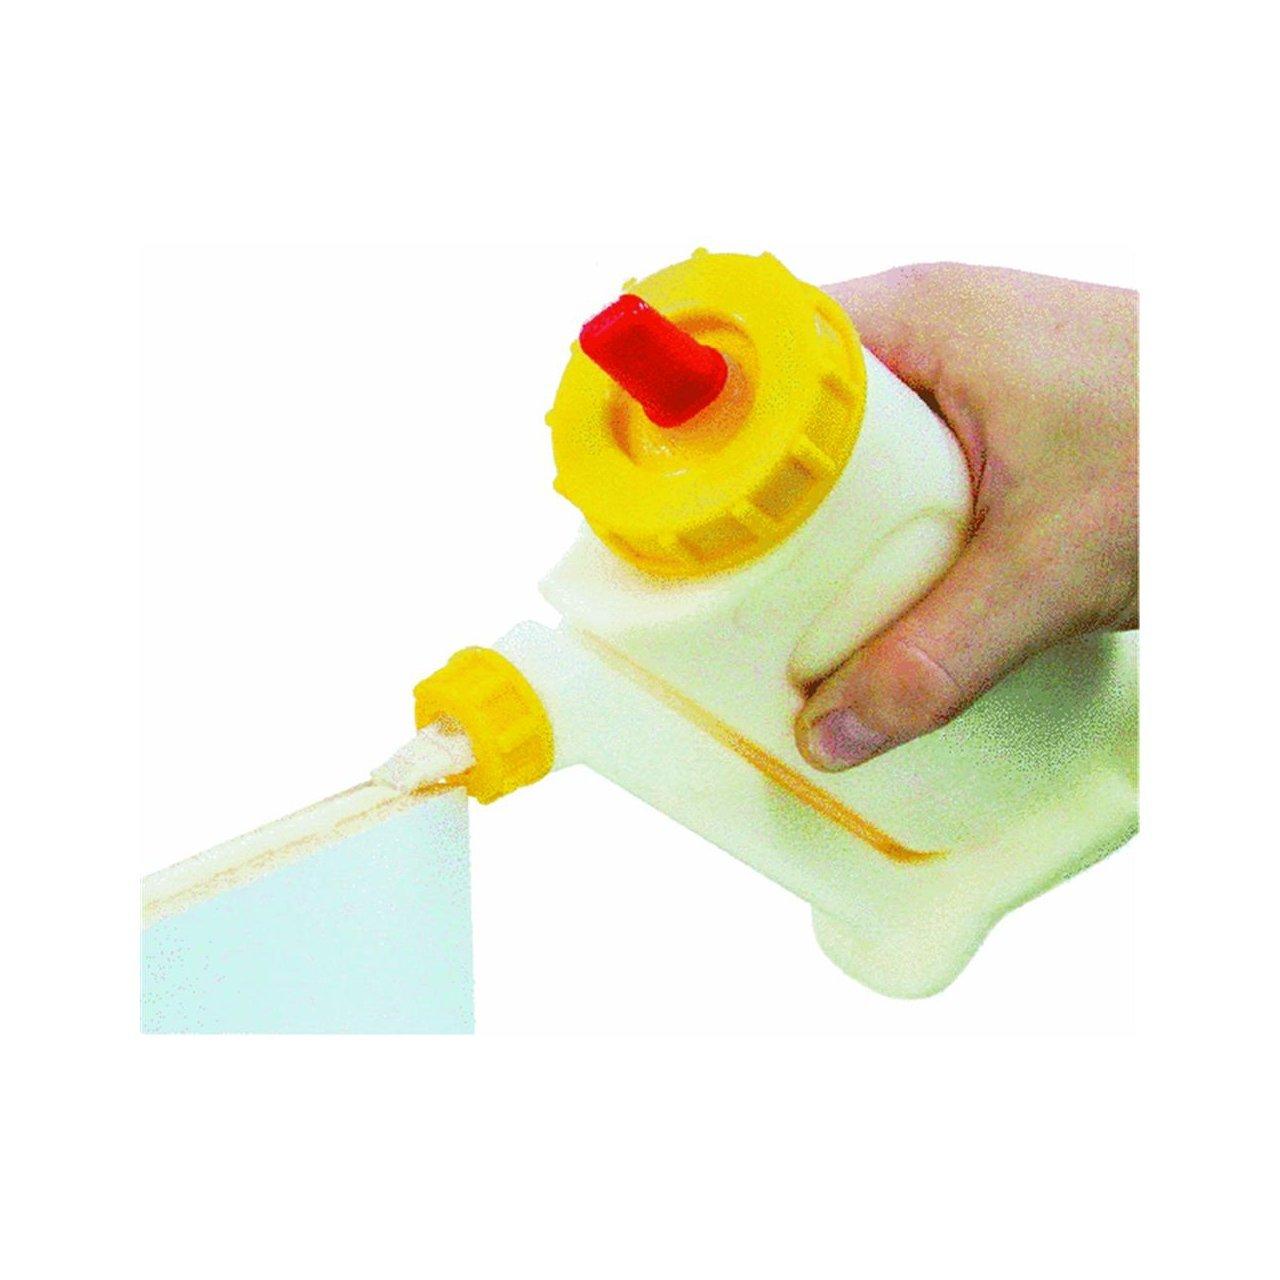 Fastcap Glu-bot Glue Bottle (16 Ounces) Pack of 2